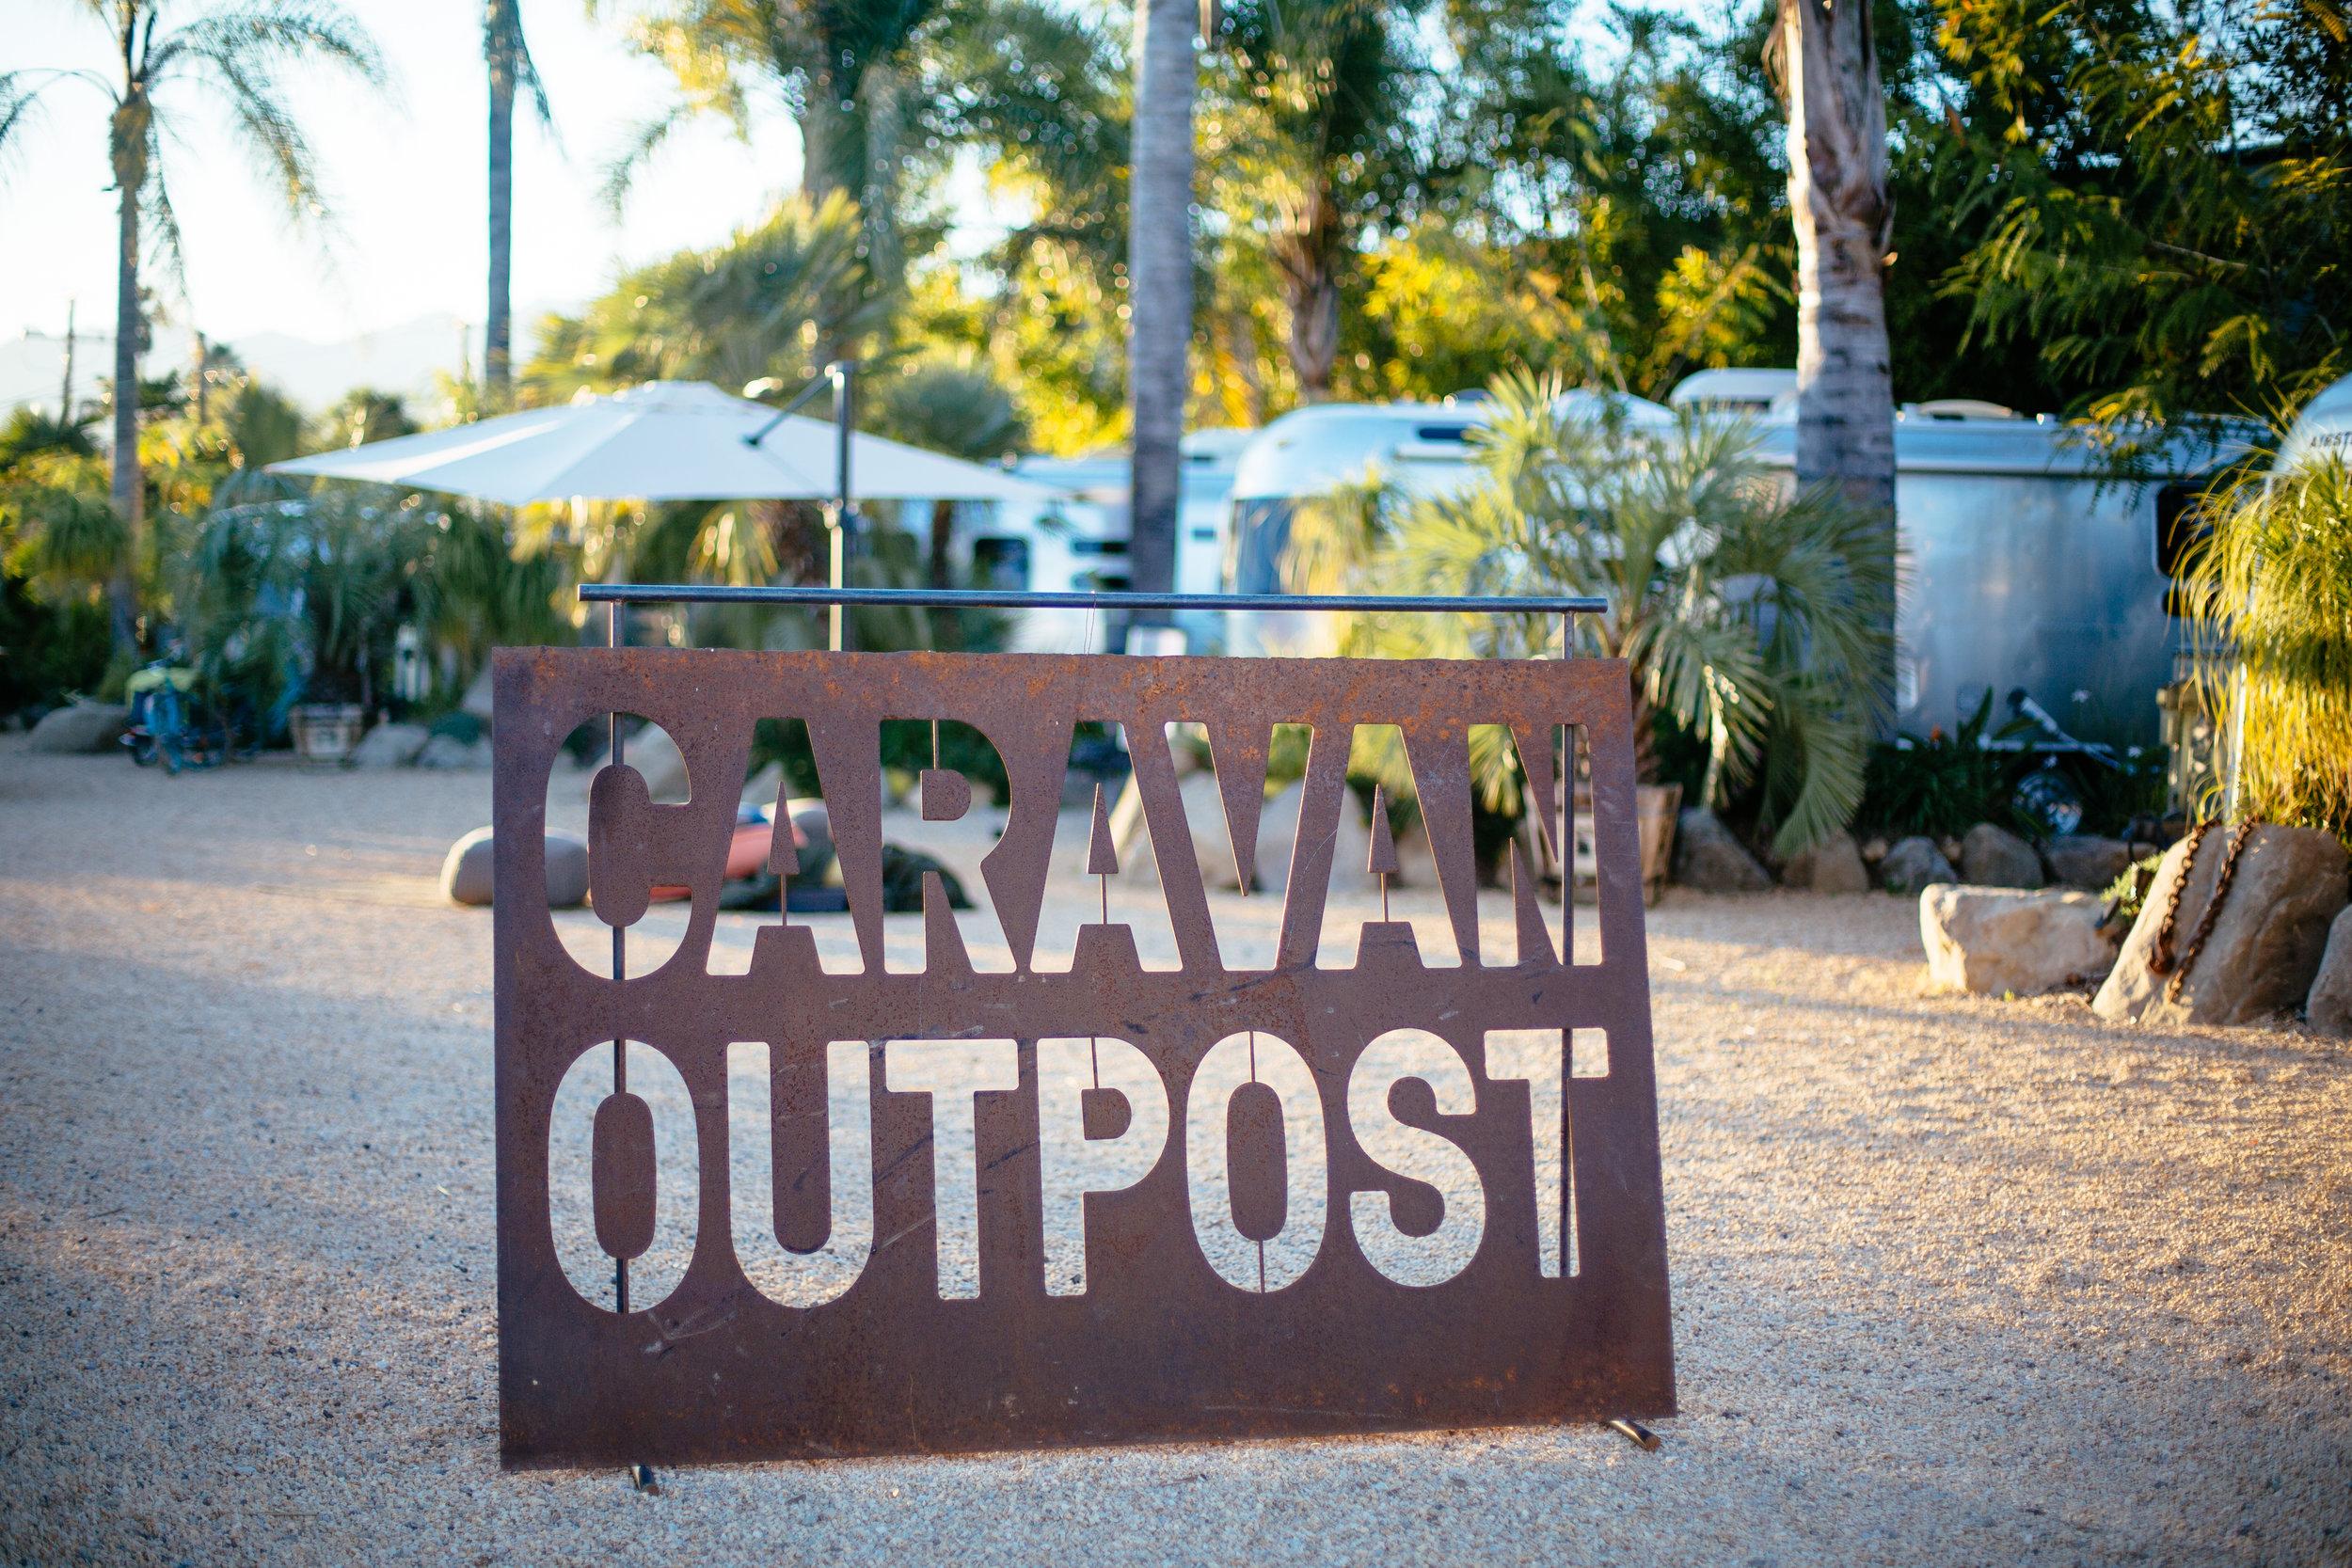 caravan outpost ojai california